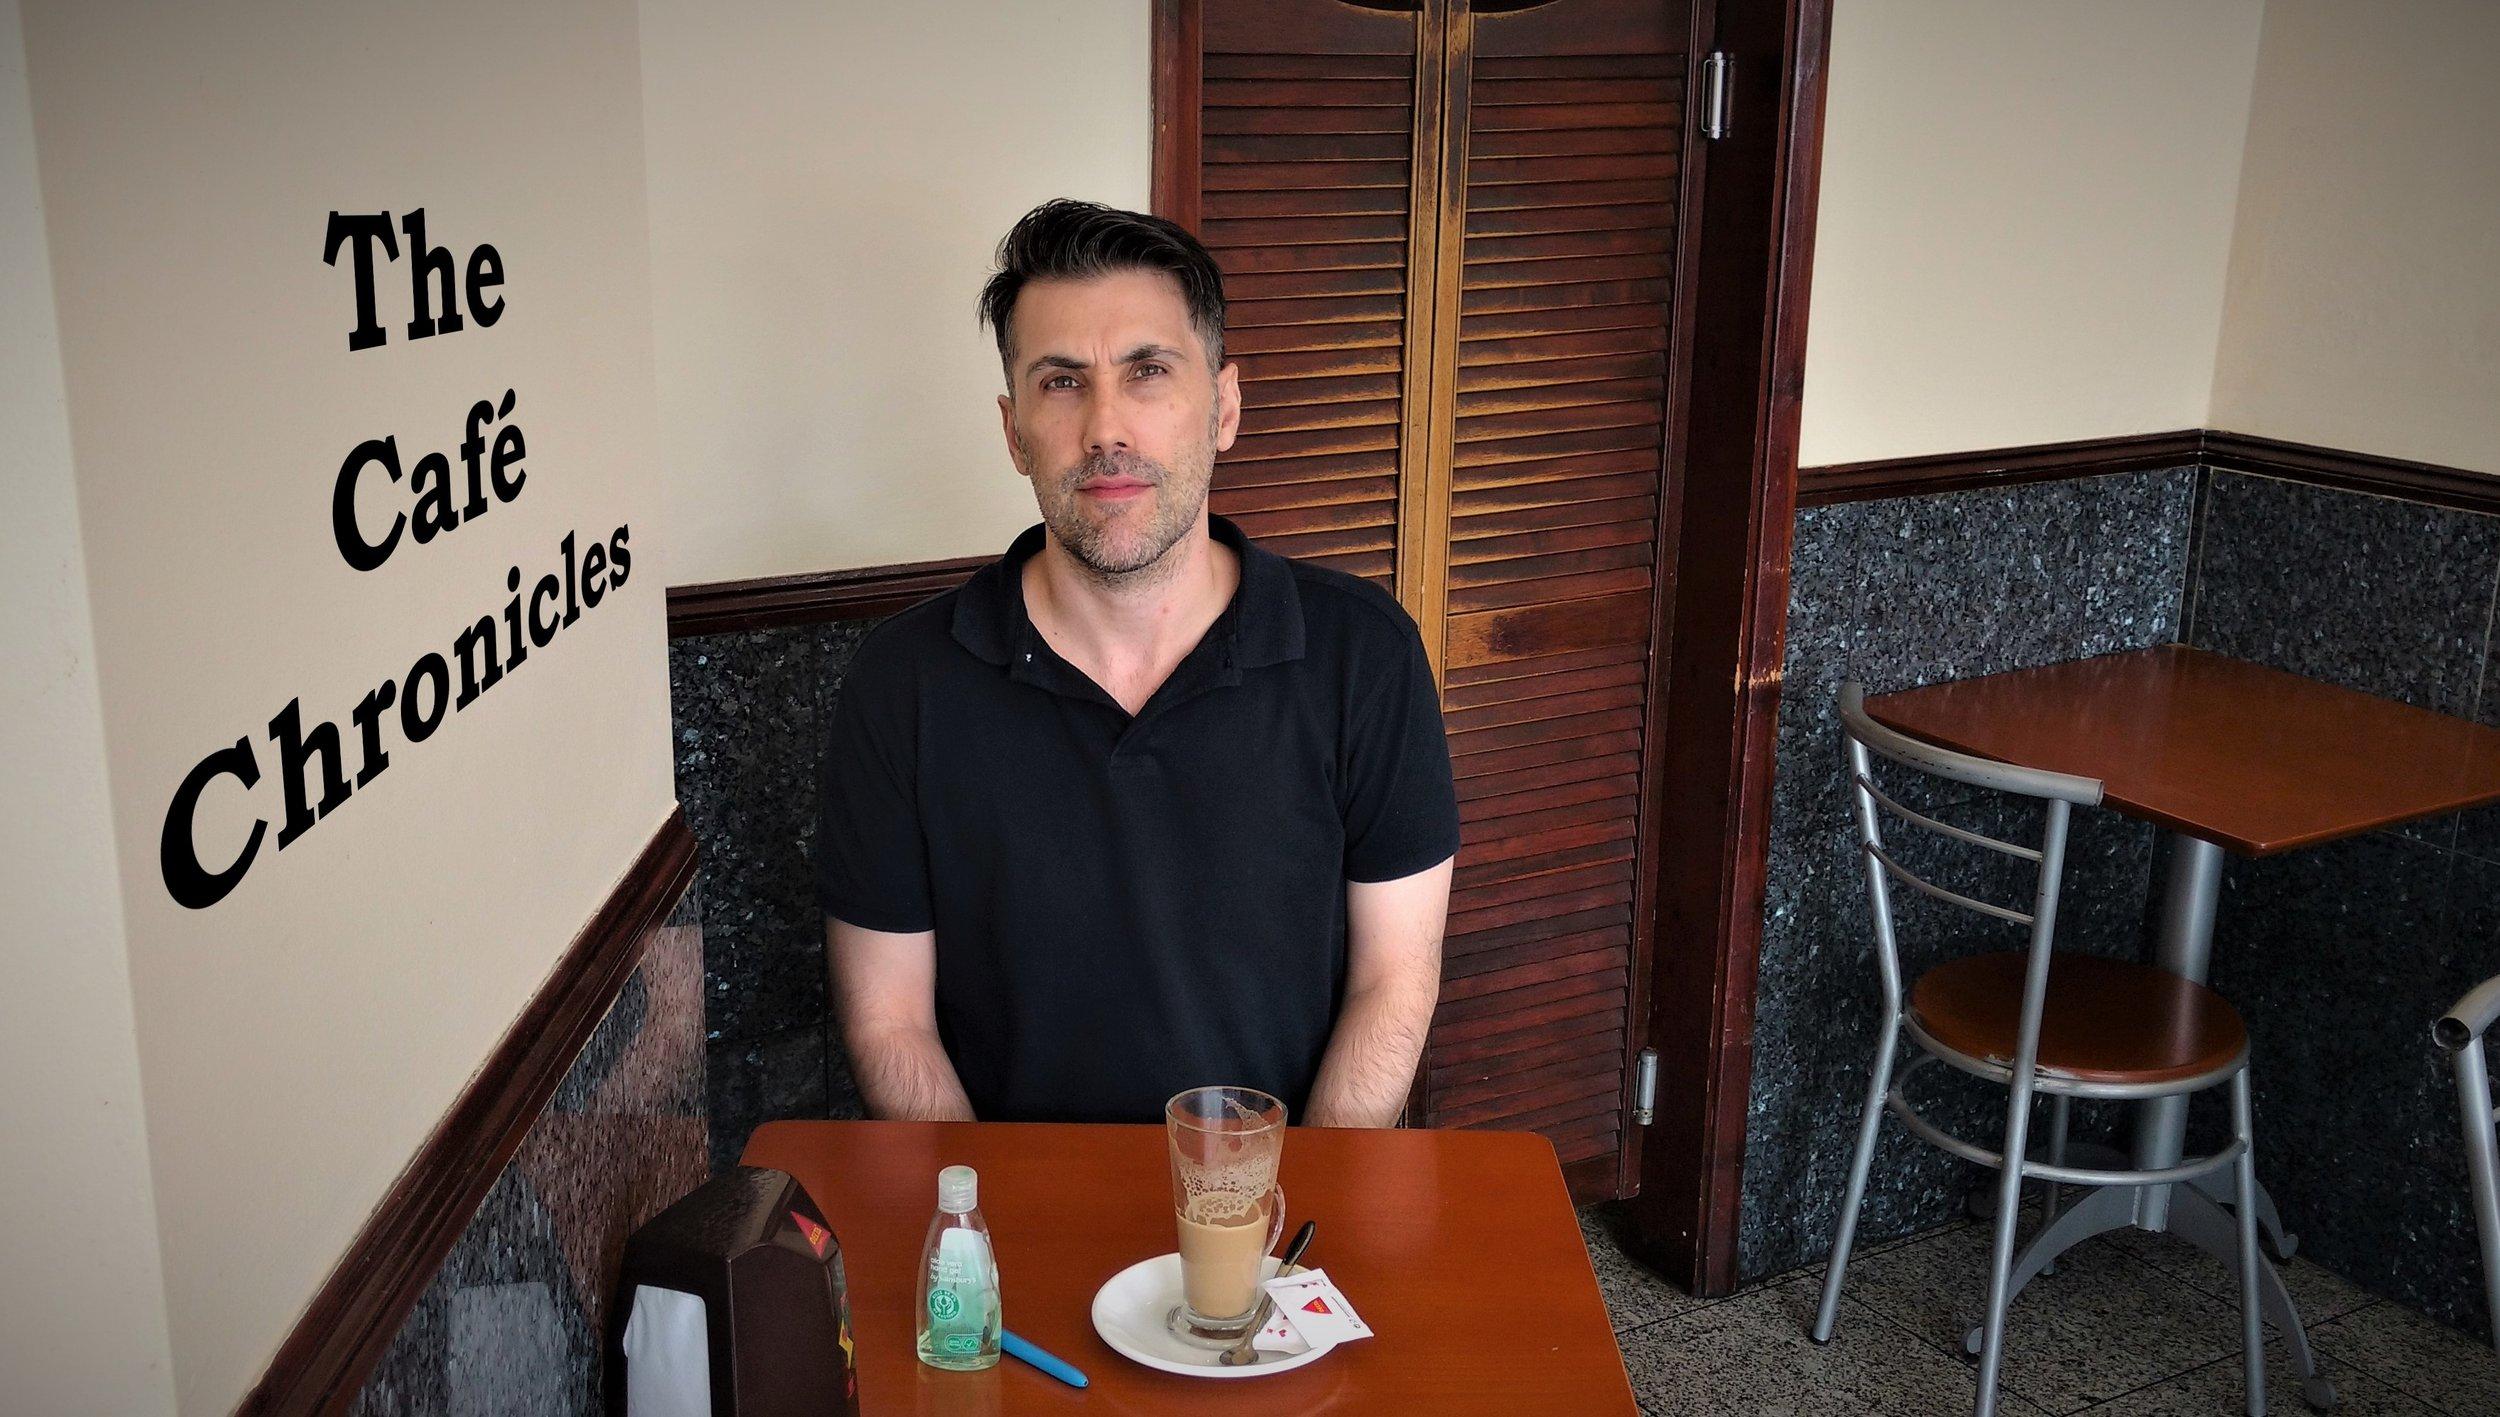 The Cafe Chronicles by Daniel Ruiz Tizon Show Image.jpg